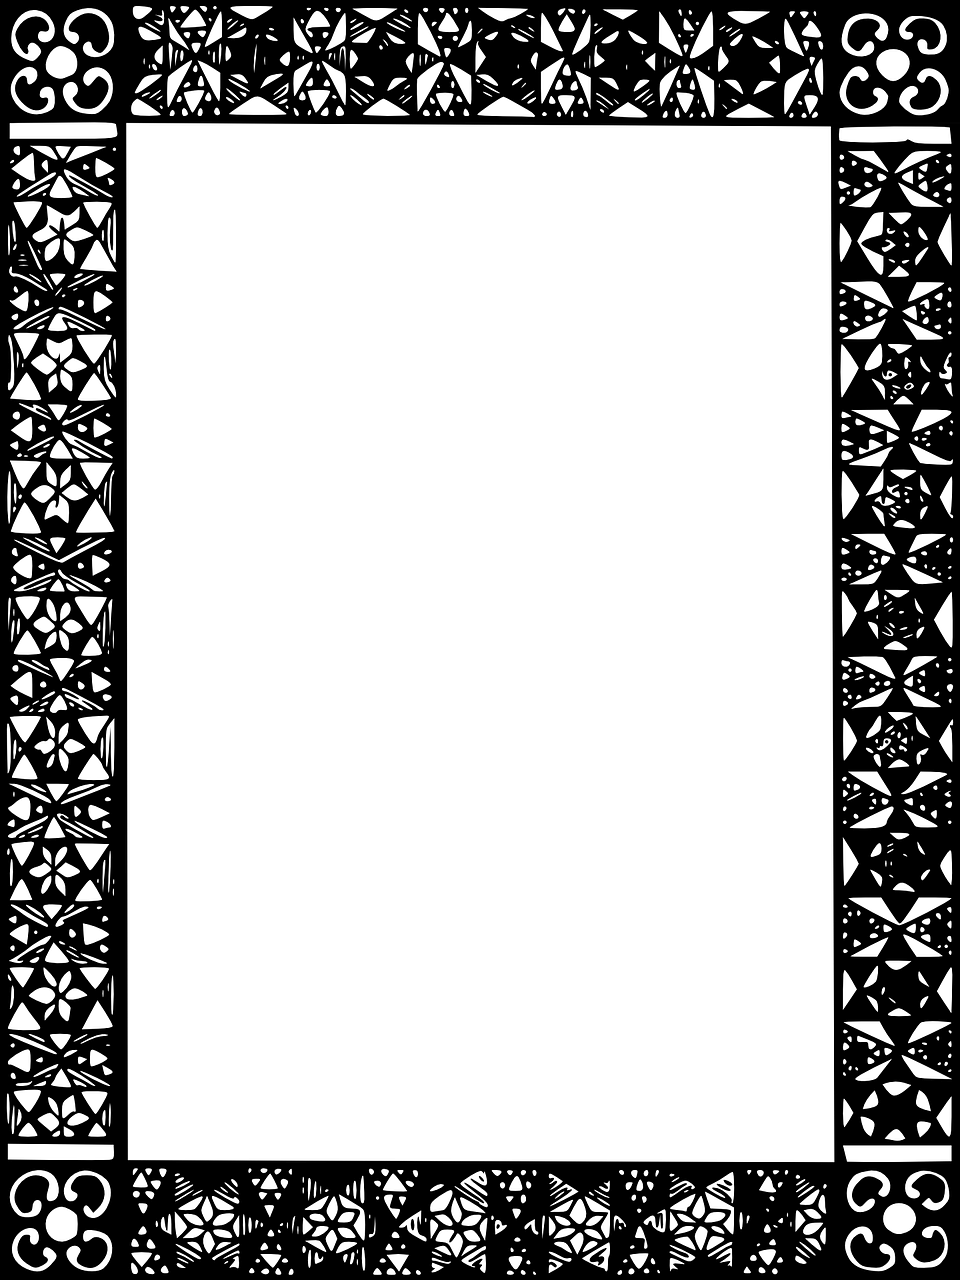 Squarelaceframe